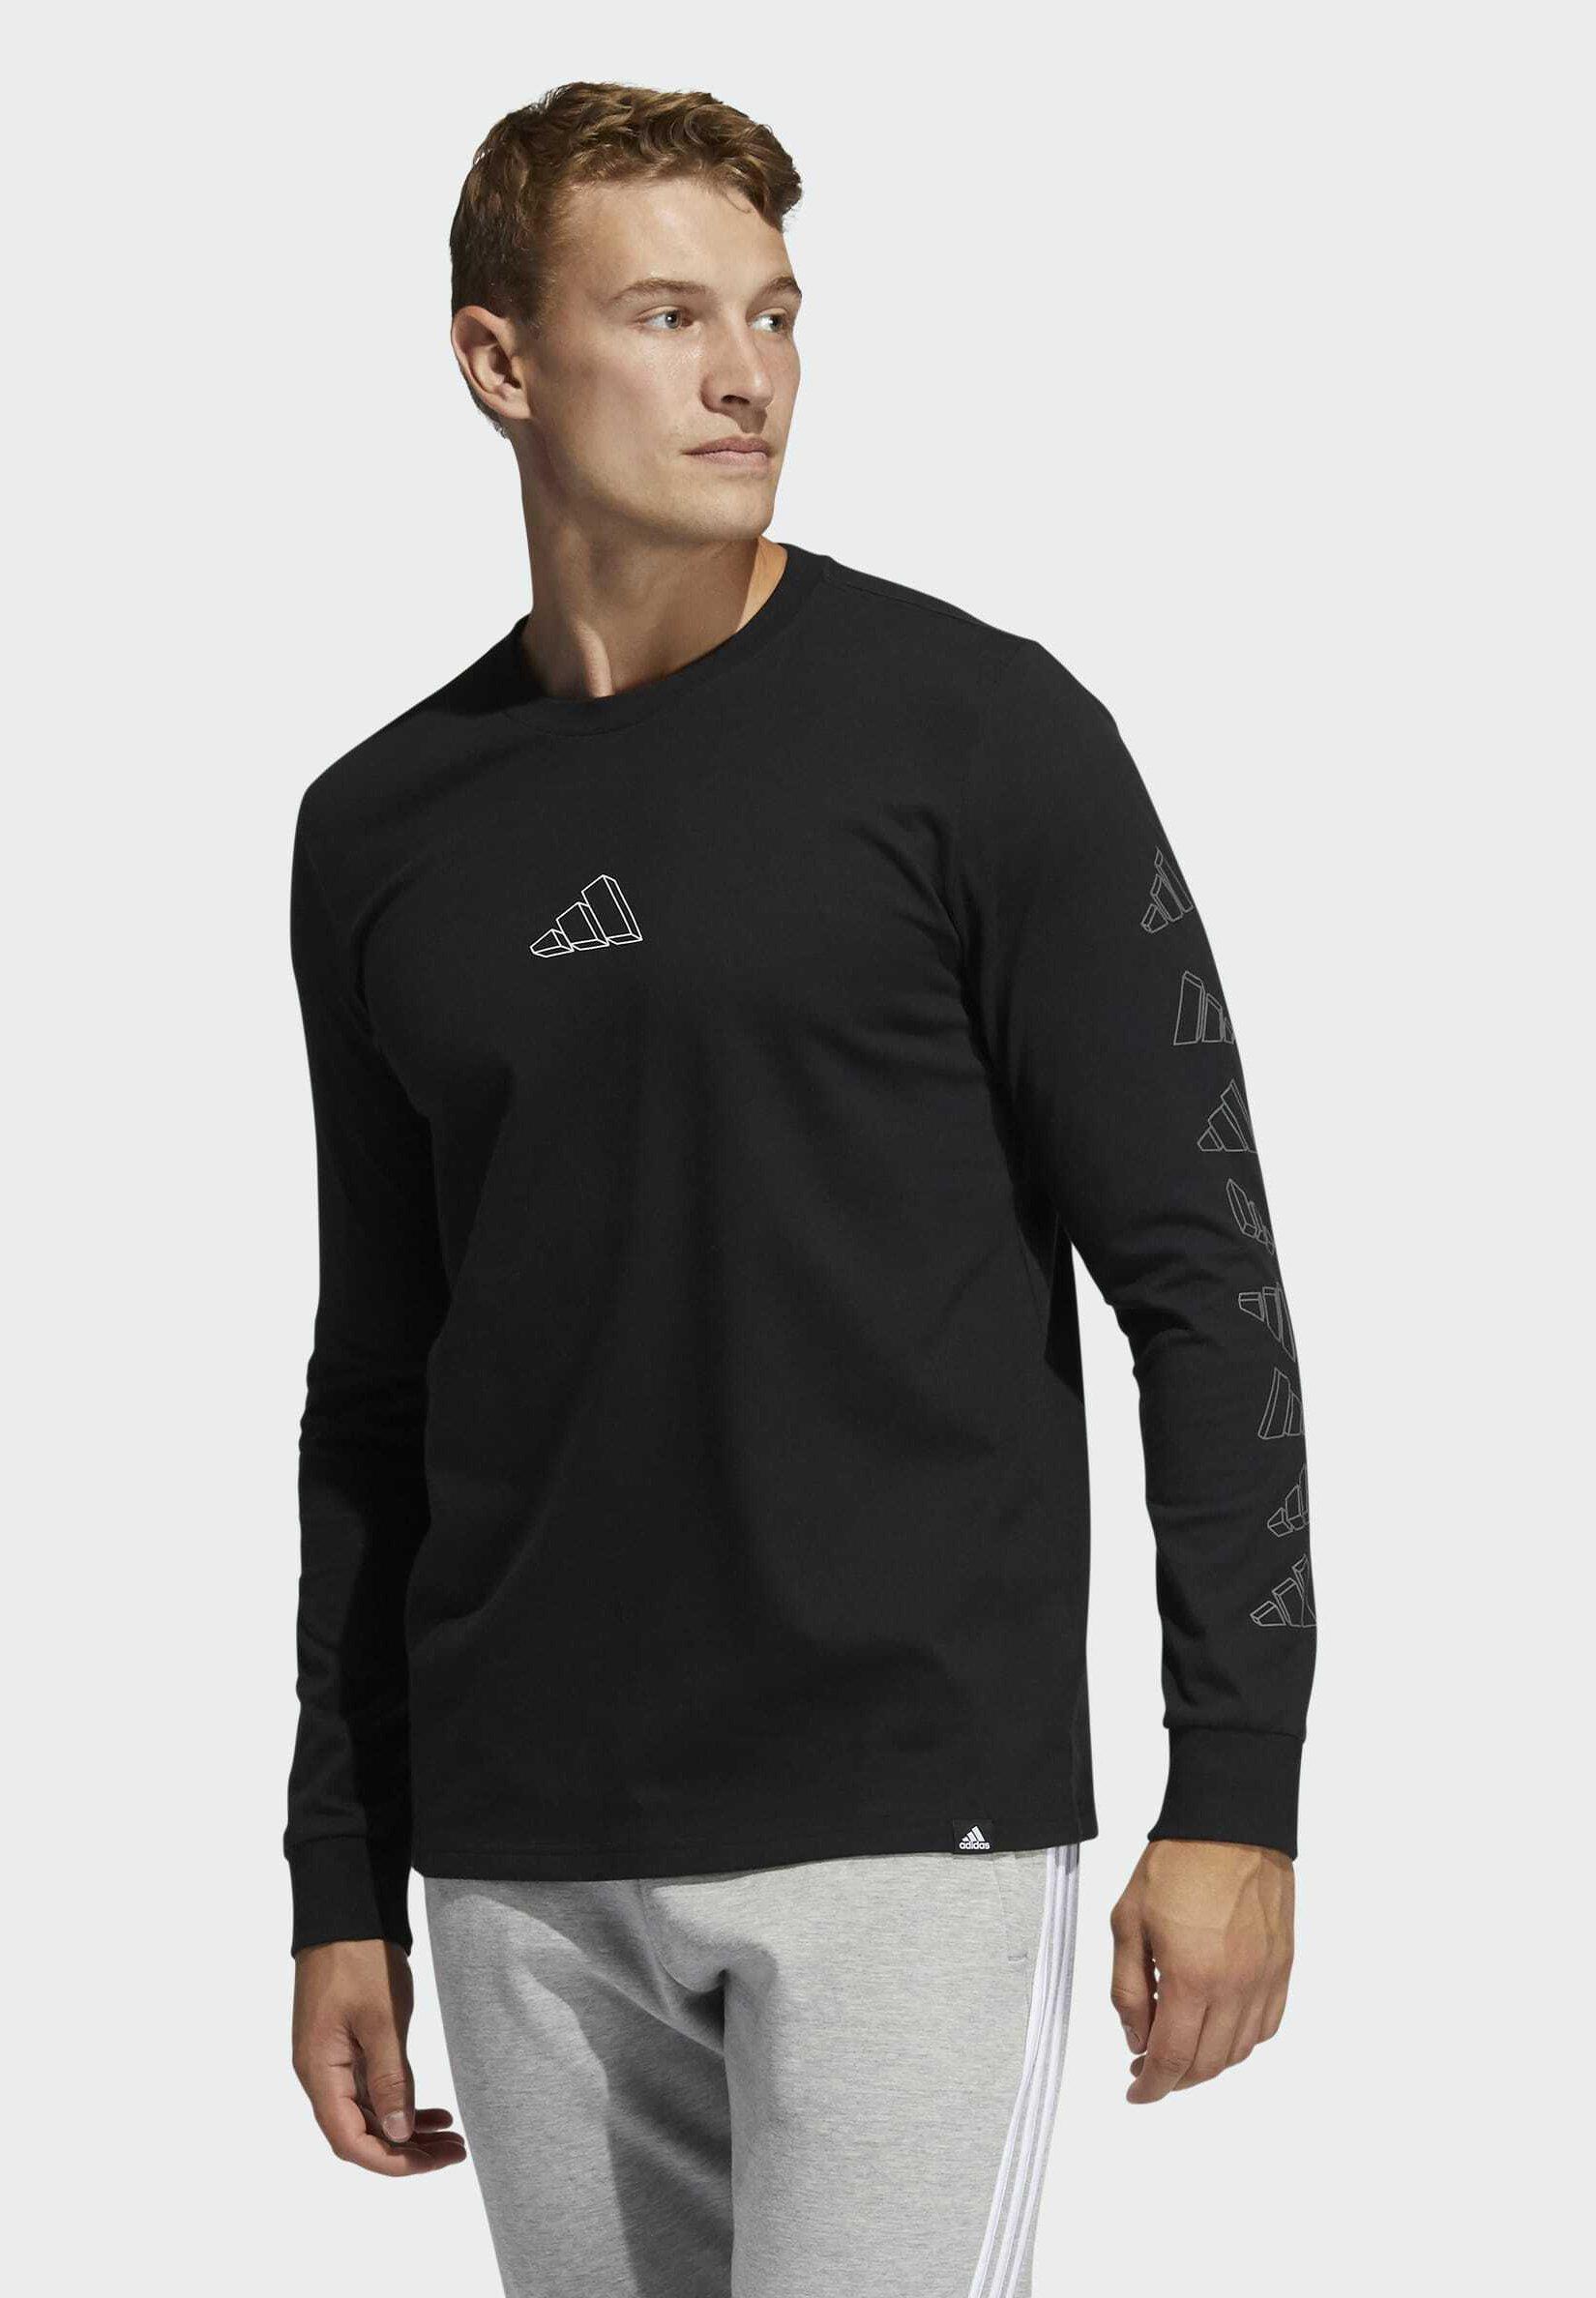 Uomo ADIDAS GEO LONG SLEEVE GRAPHIC T-SHIRT - Maglietta a manica lunga